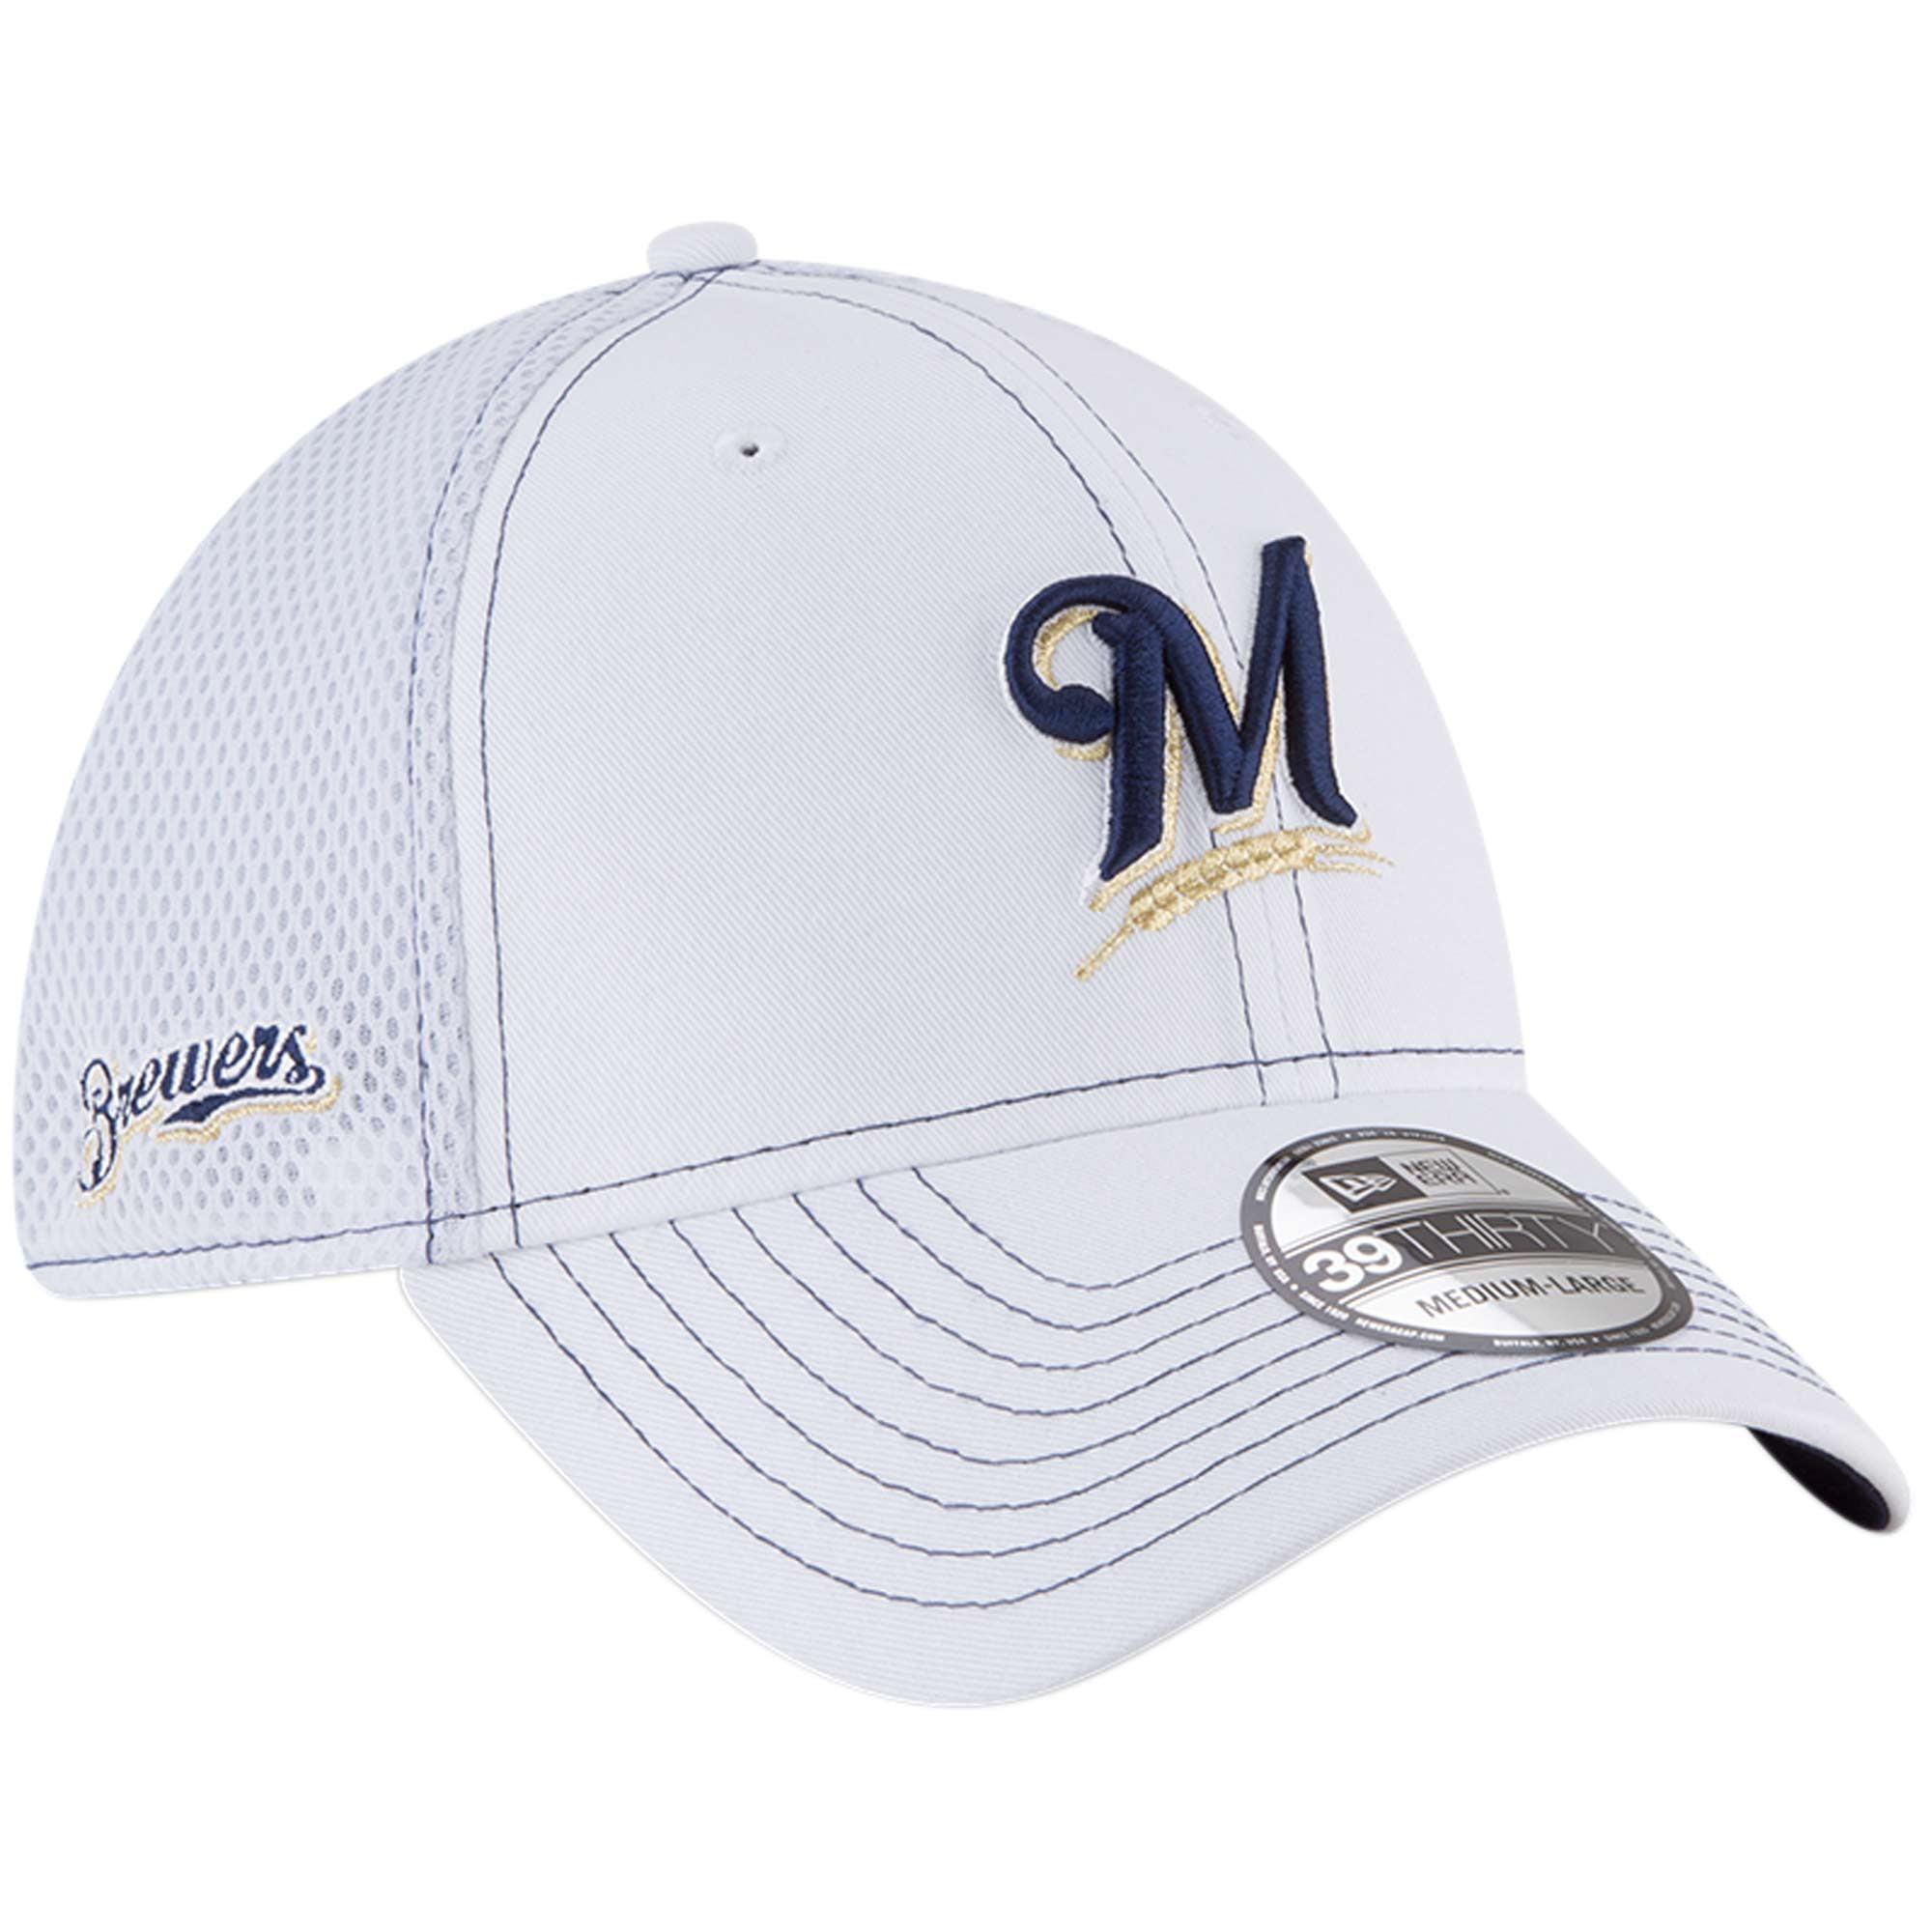 quality design f75ed fb4cb Milwaukee Brewers New Era Team Turn Neo 39THIRTY Flex Hat - White -  Walmart.com